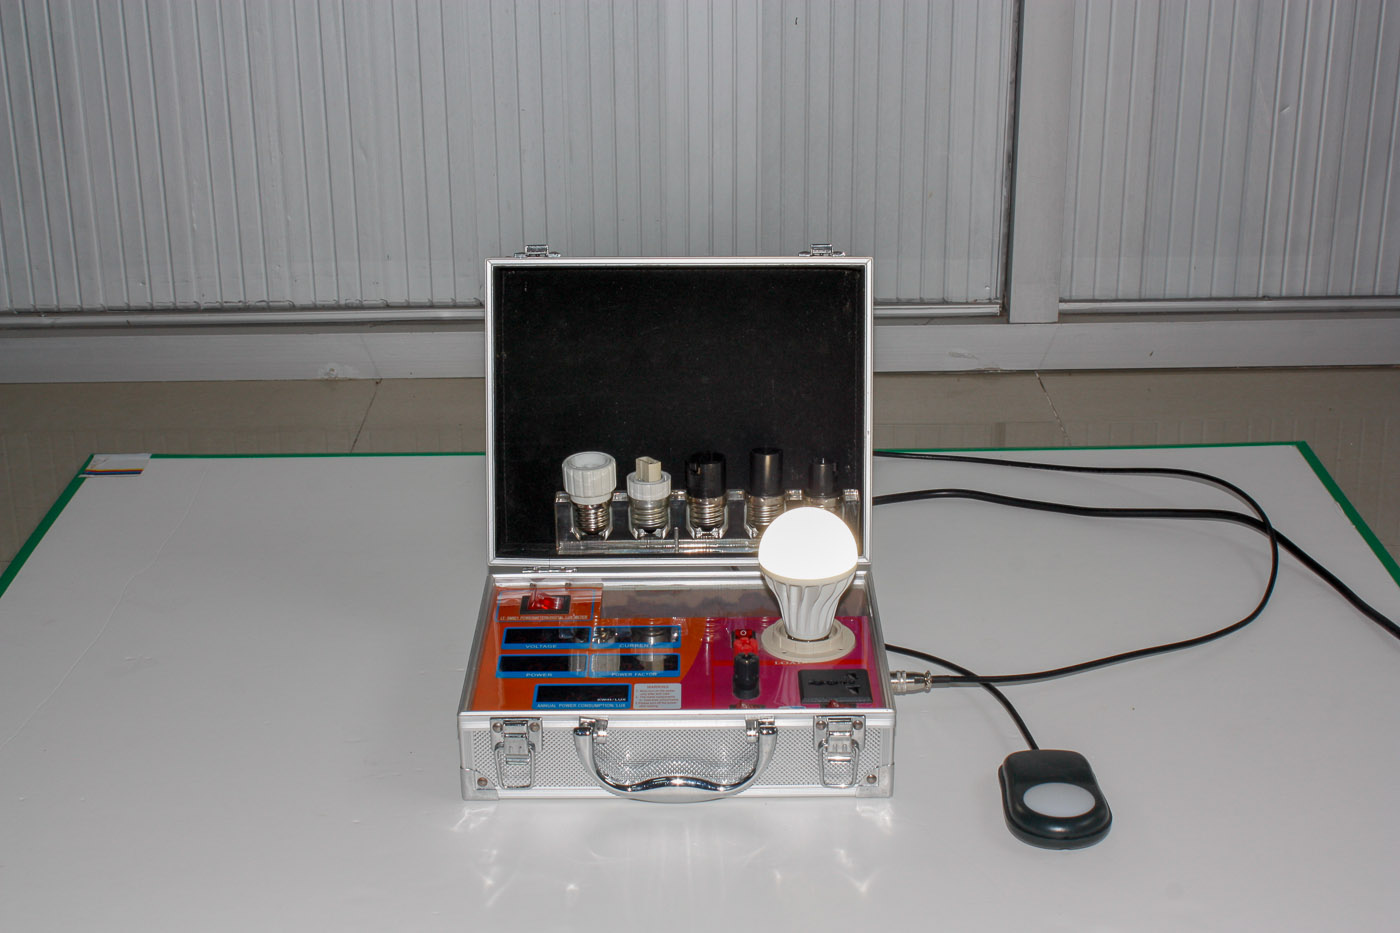 Lux meter led lamp demo case CCT meter LT-SM921